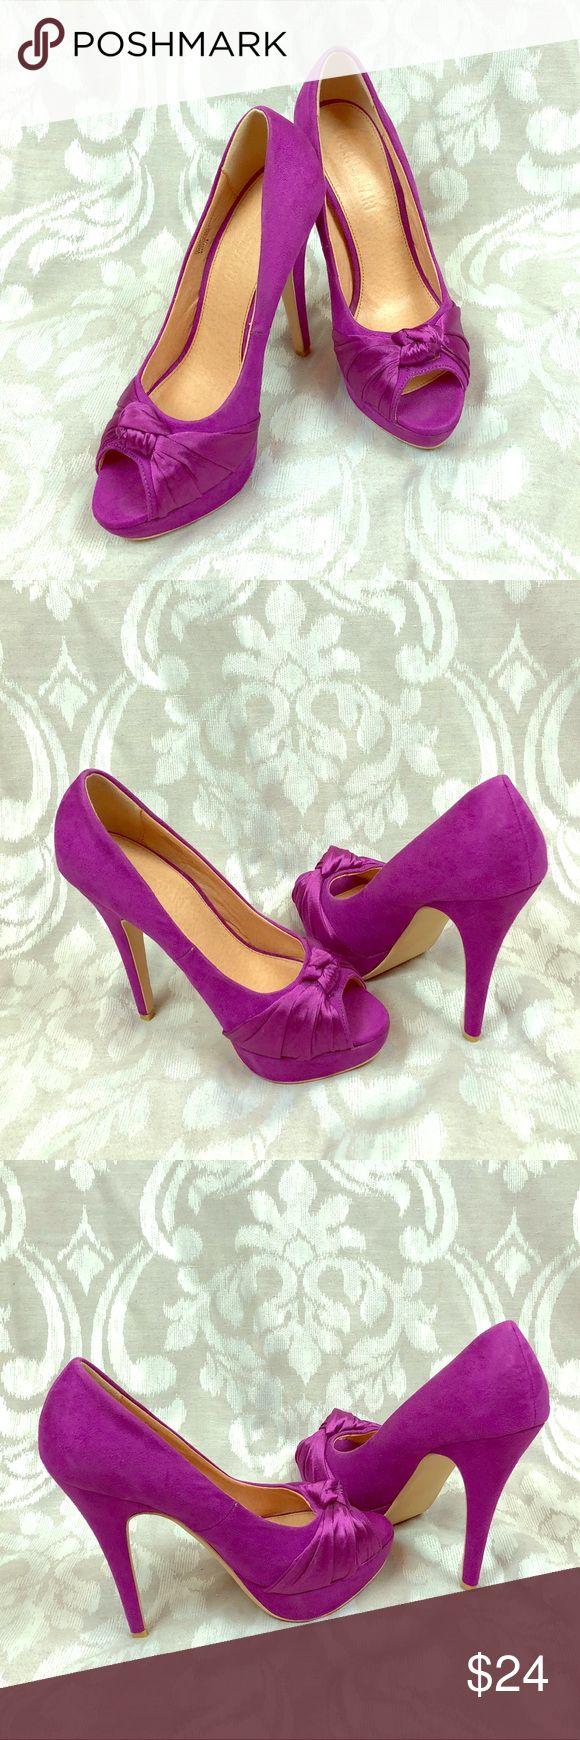 Colin Stuart purple open toe bow platform heels See sole conditions Colin Stuart Shoes Heels